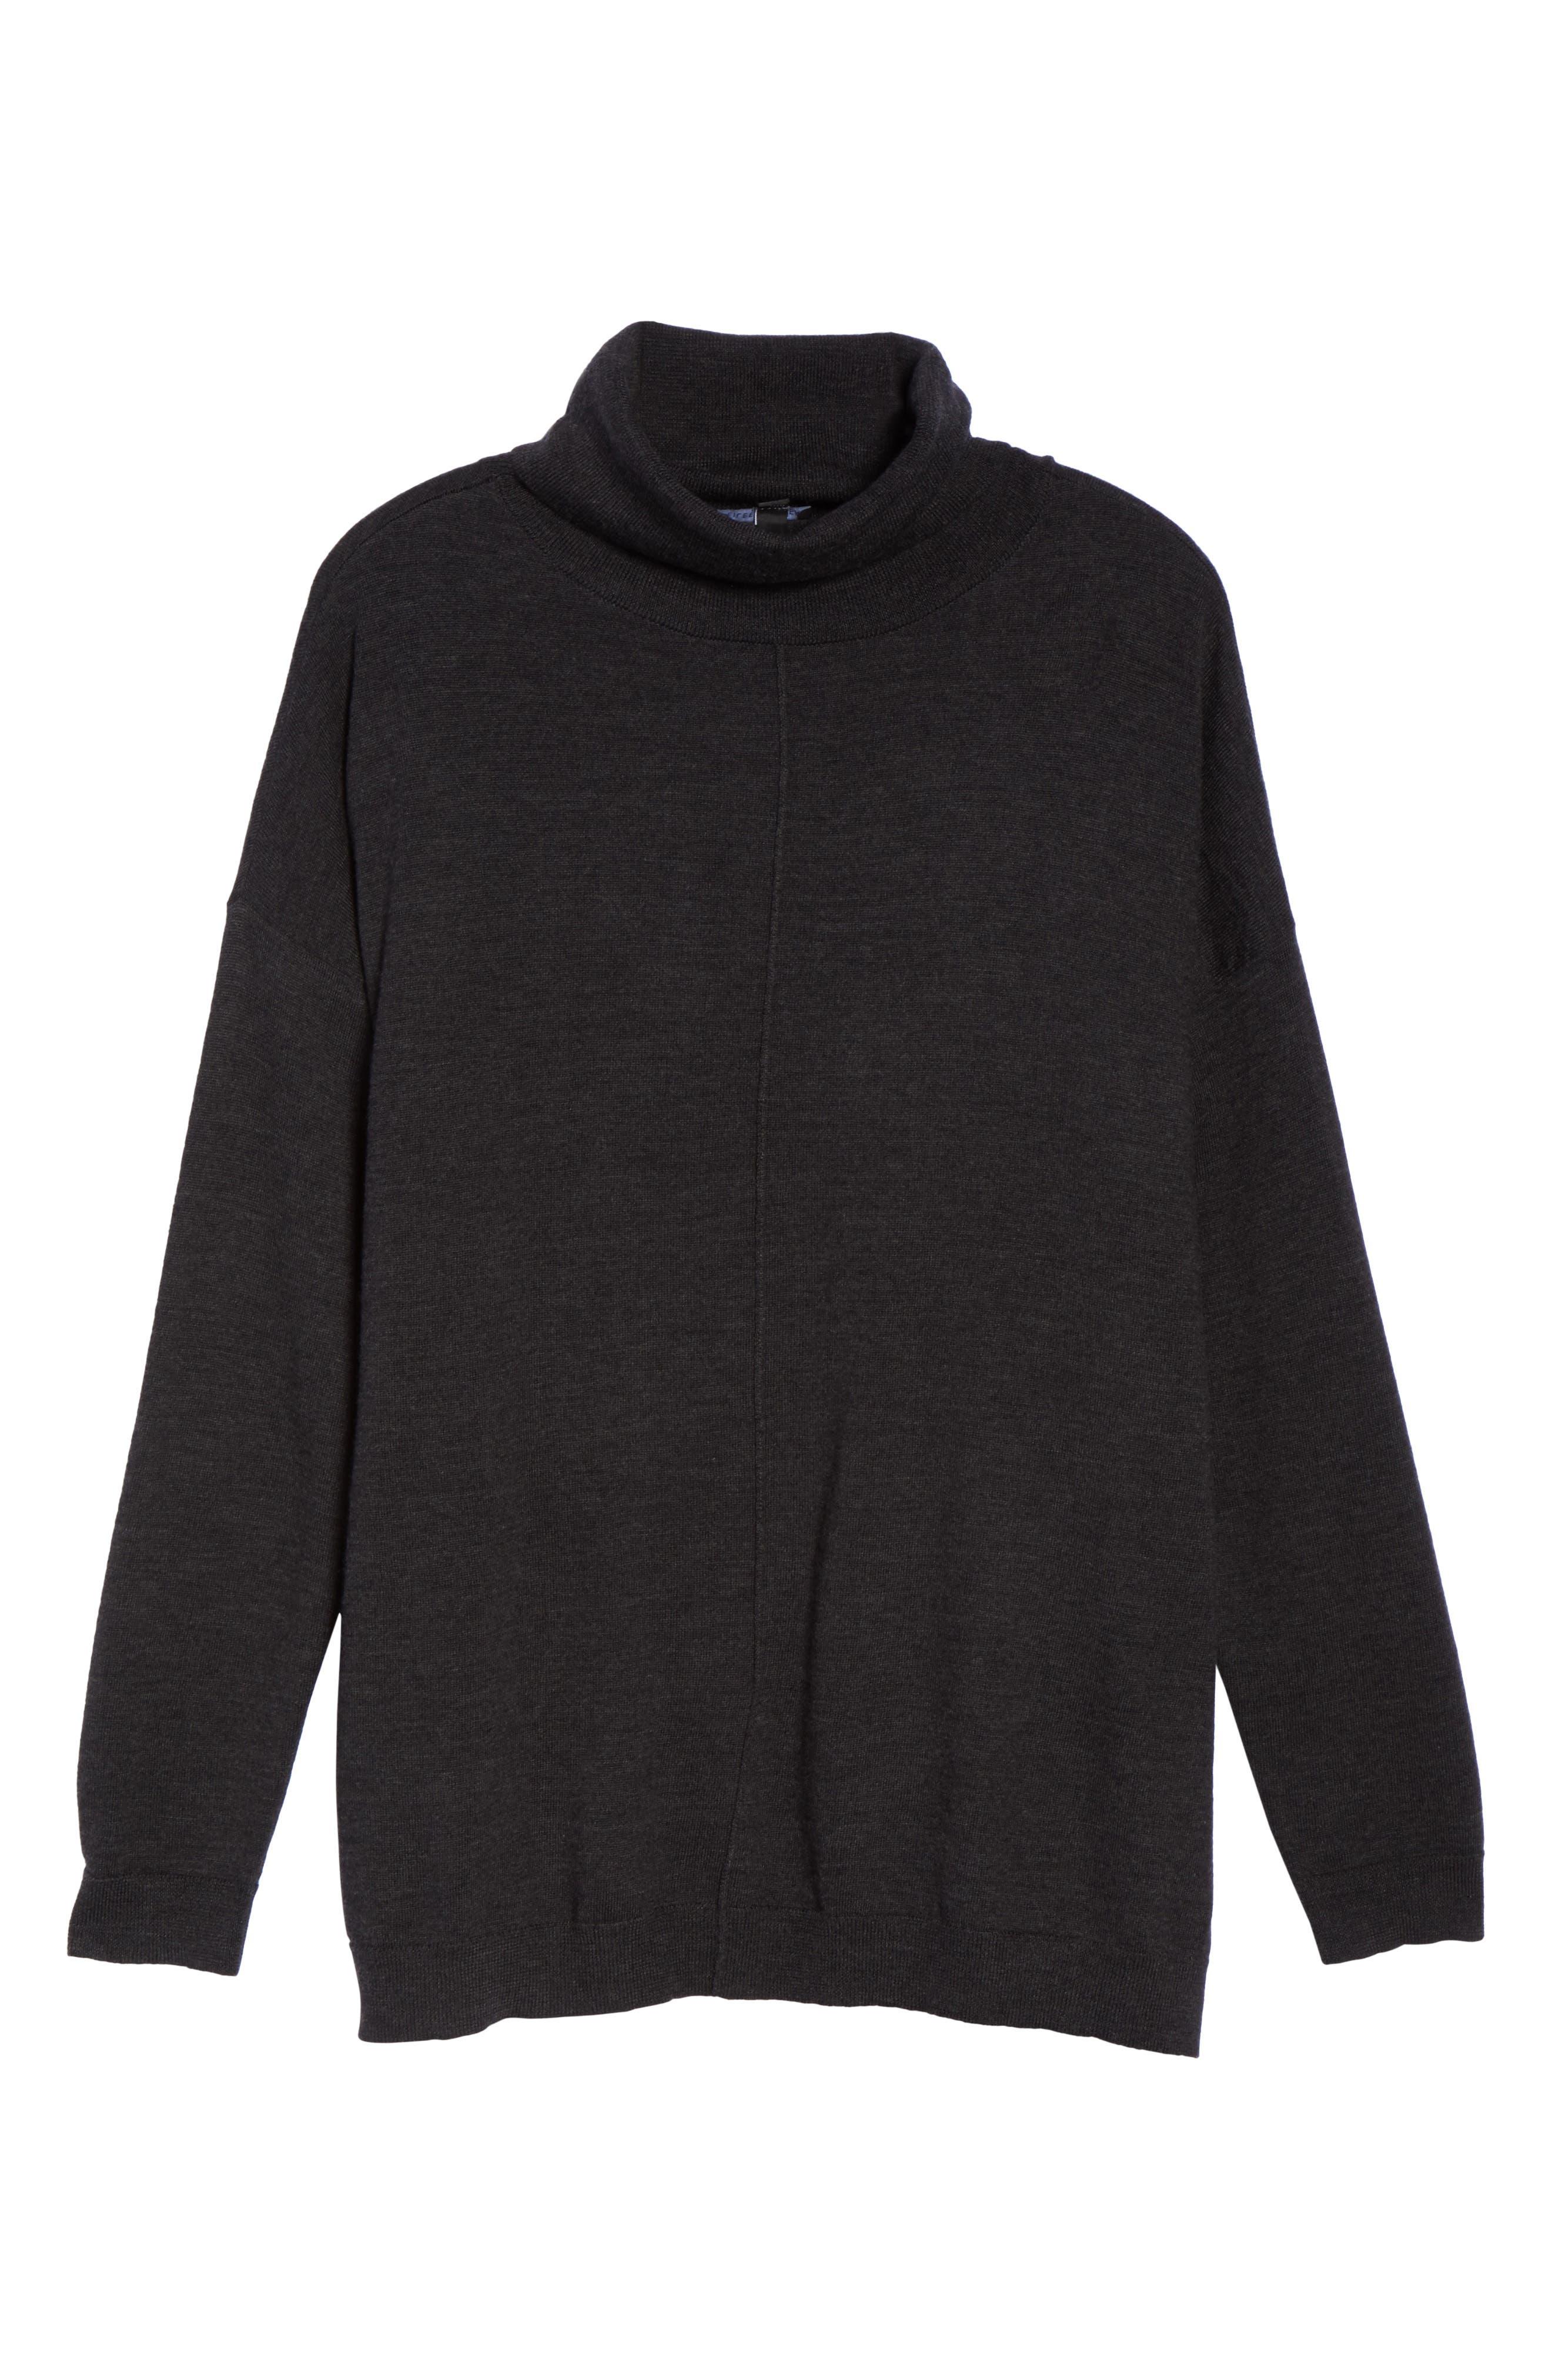 Merino Wool Turtleneck Sweater,                             Alternate thumbnail 6, color,                             021